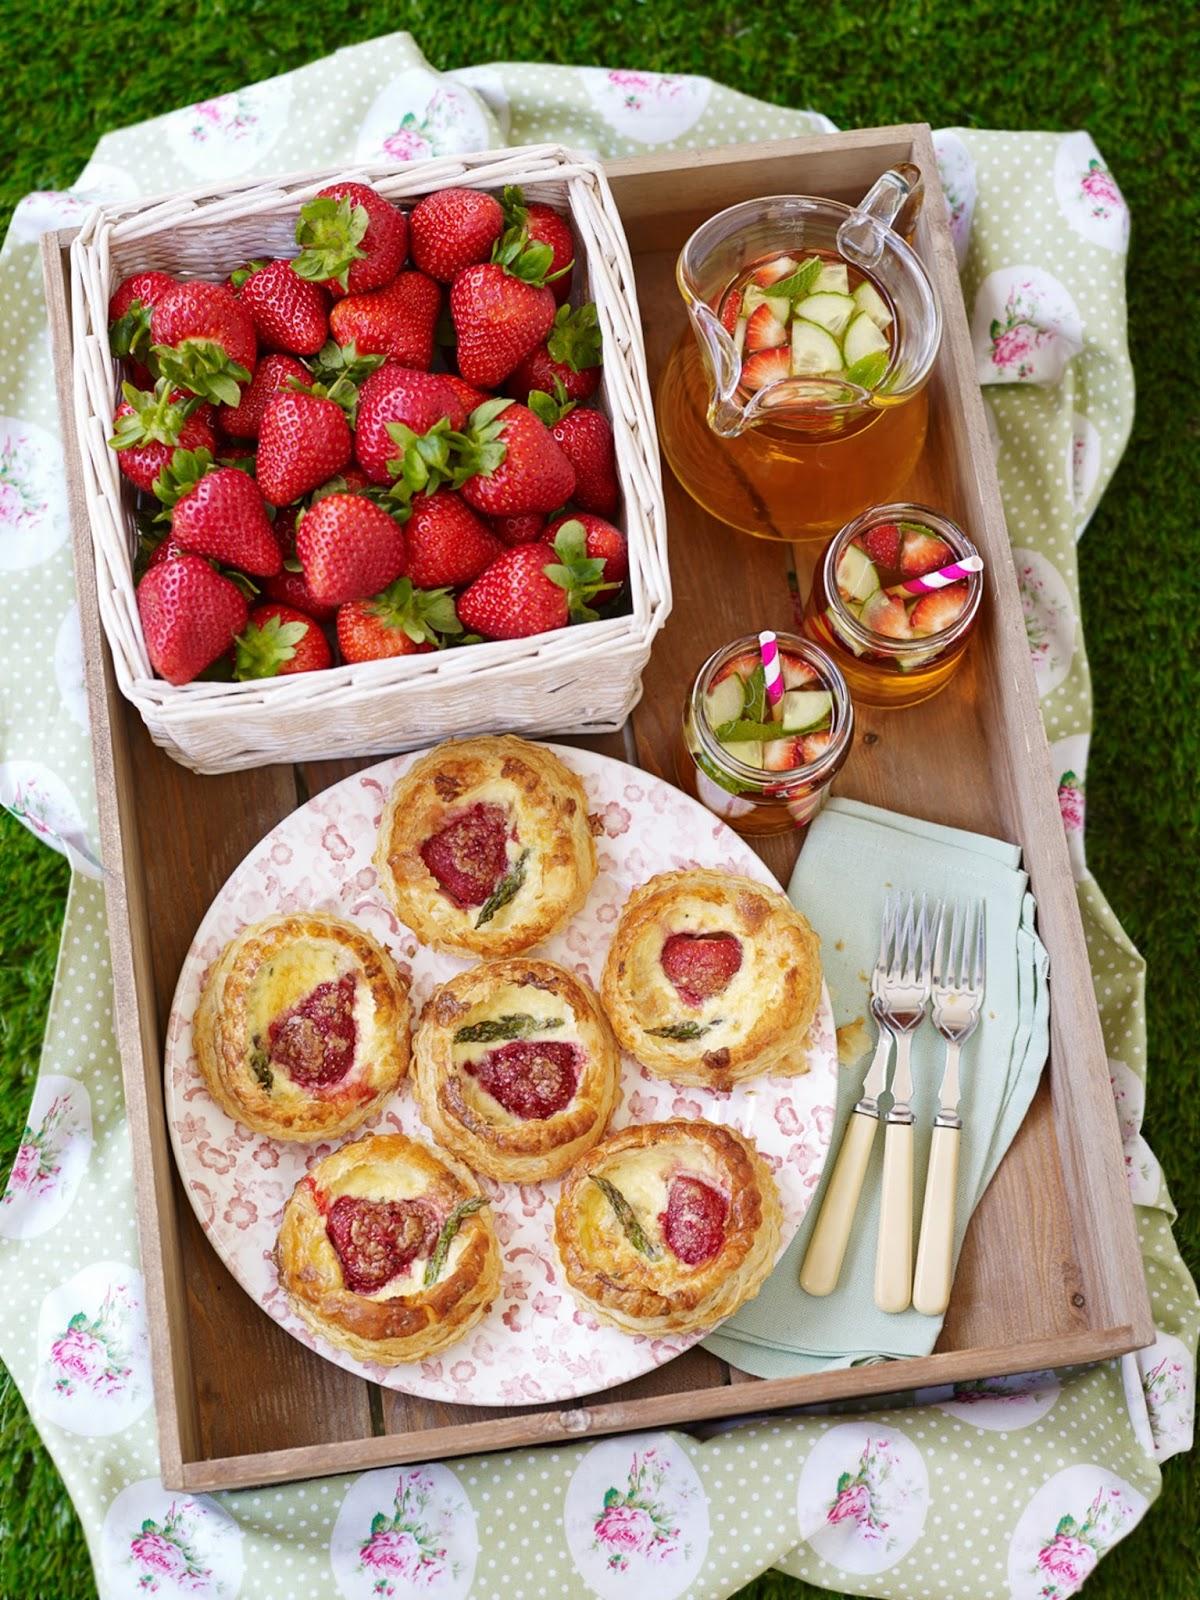 BerryWorld Strawberry And British Asparagus Mini Quiches.